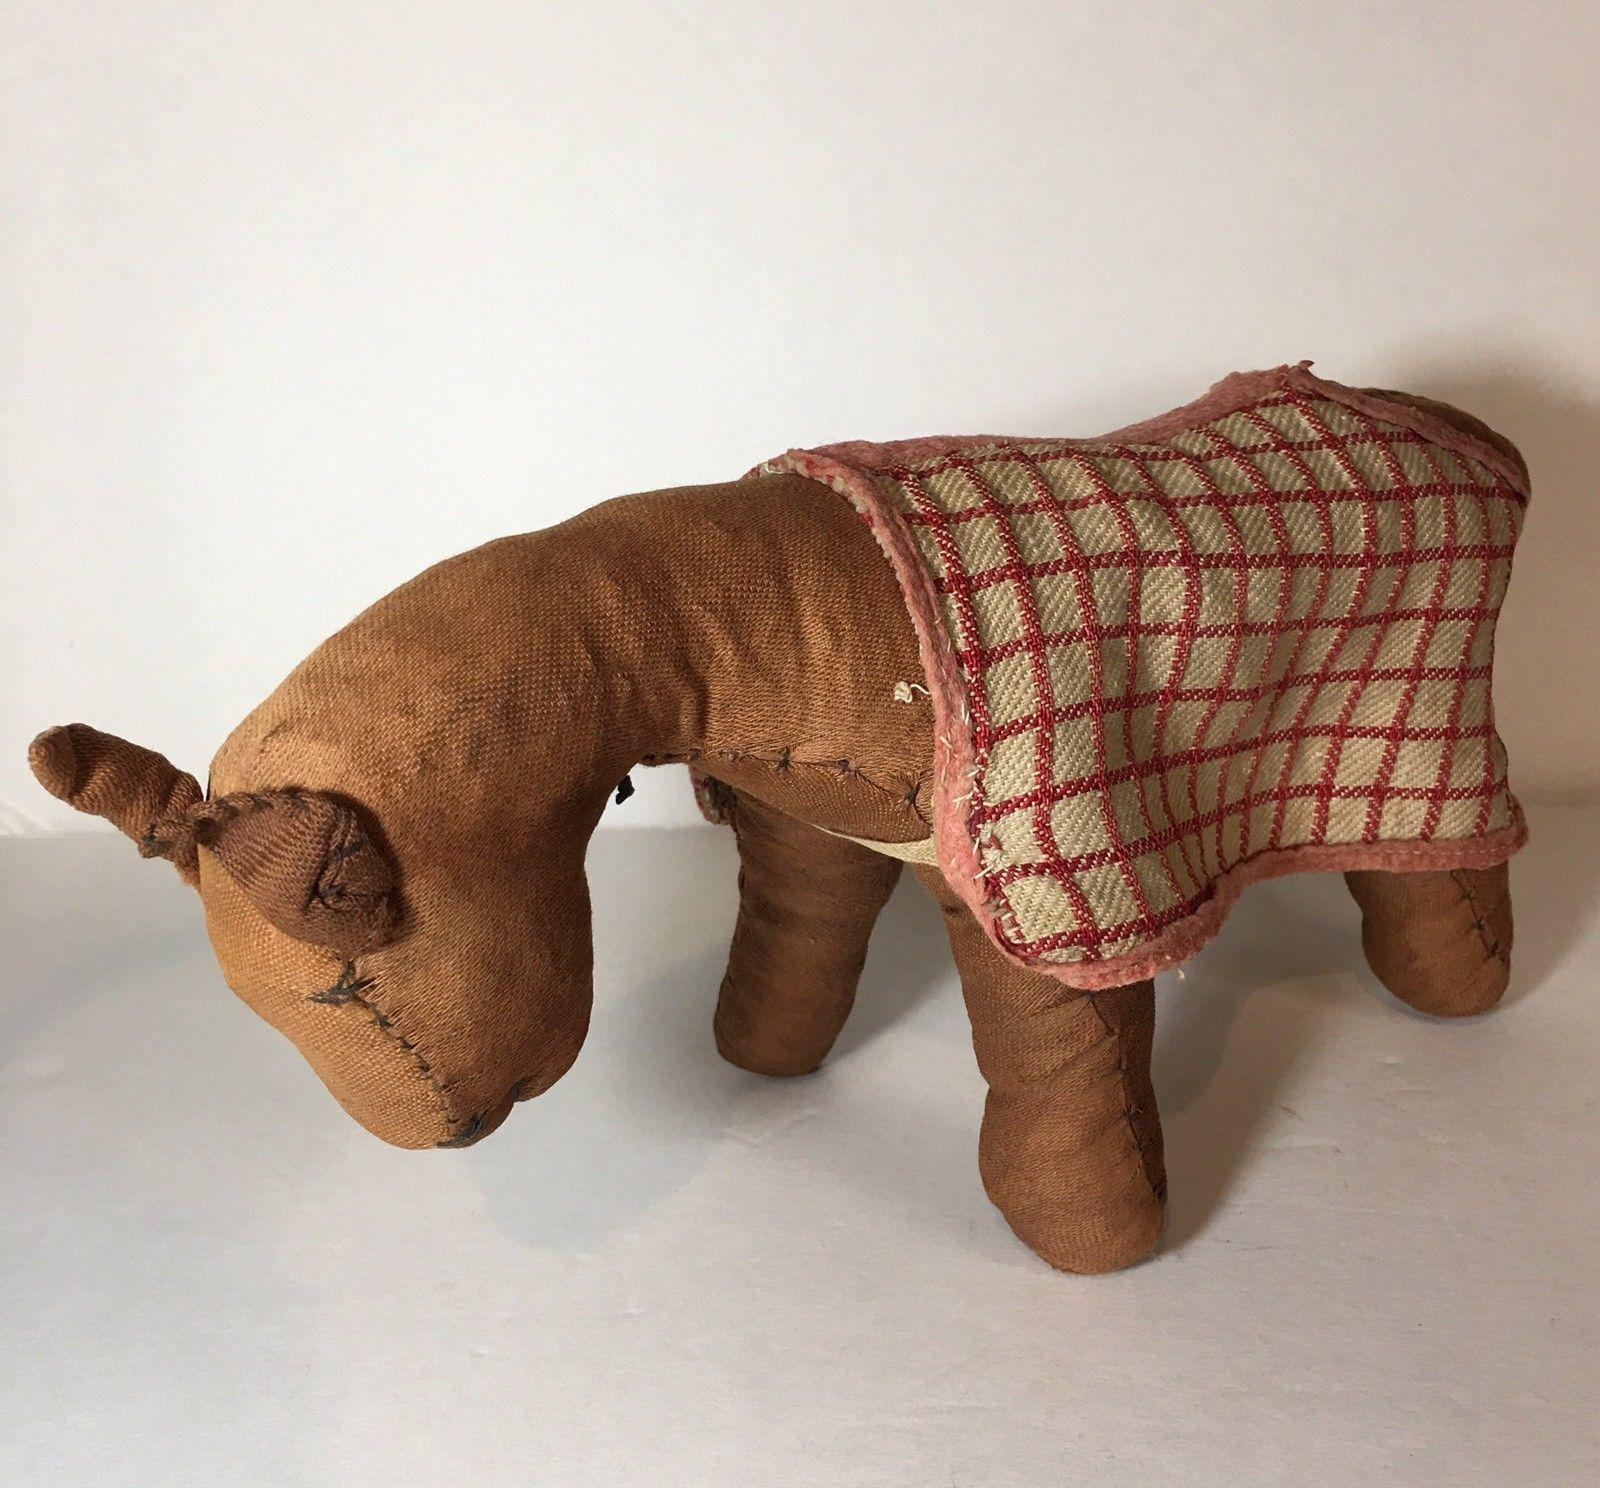 RARE EARLY ANTIQUE 1800s OHIO AMISH STRAW STUFFED HANDMADE CLOTH